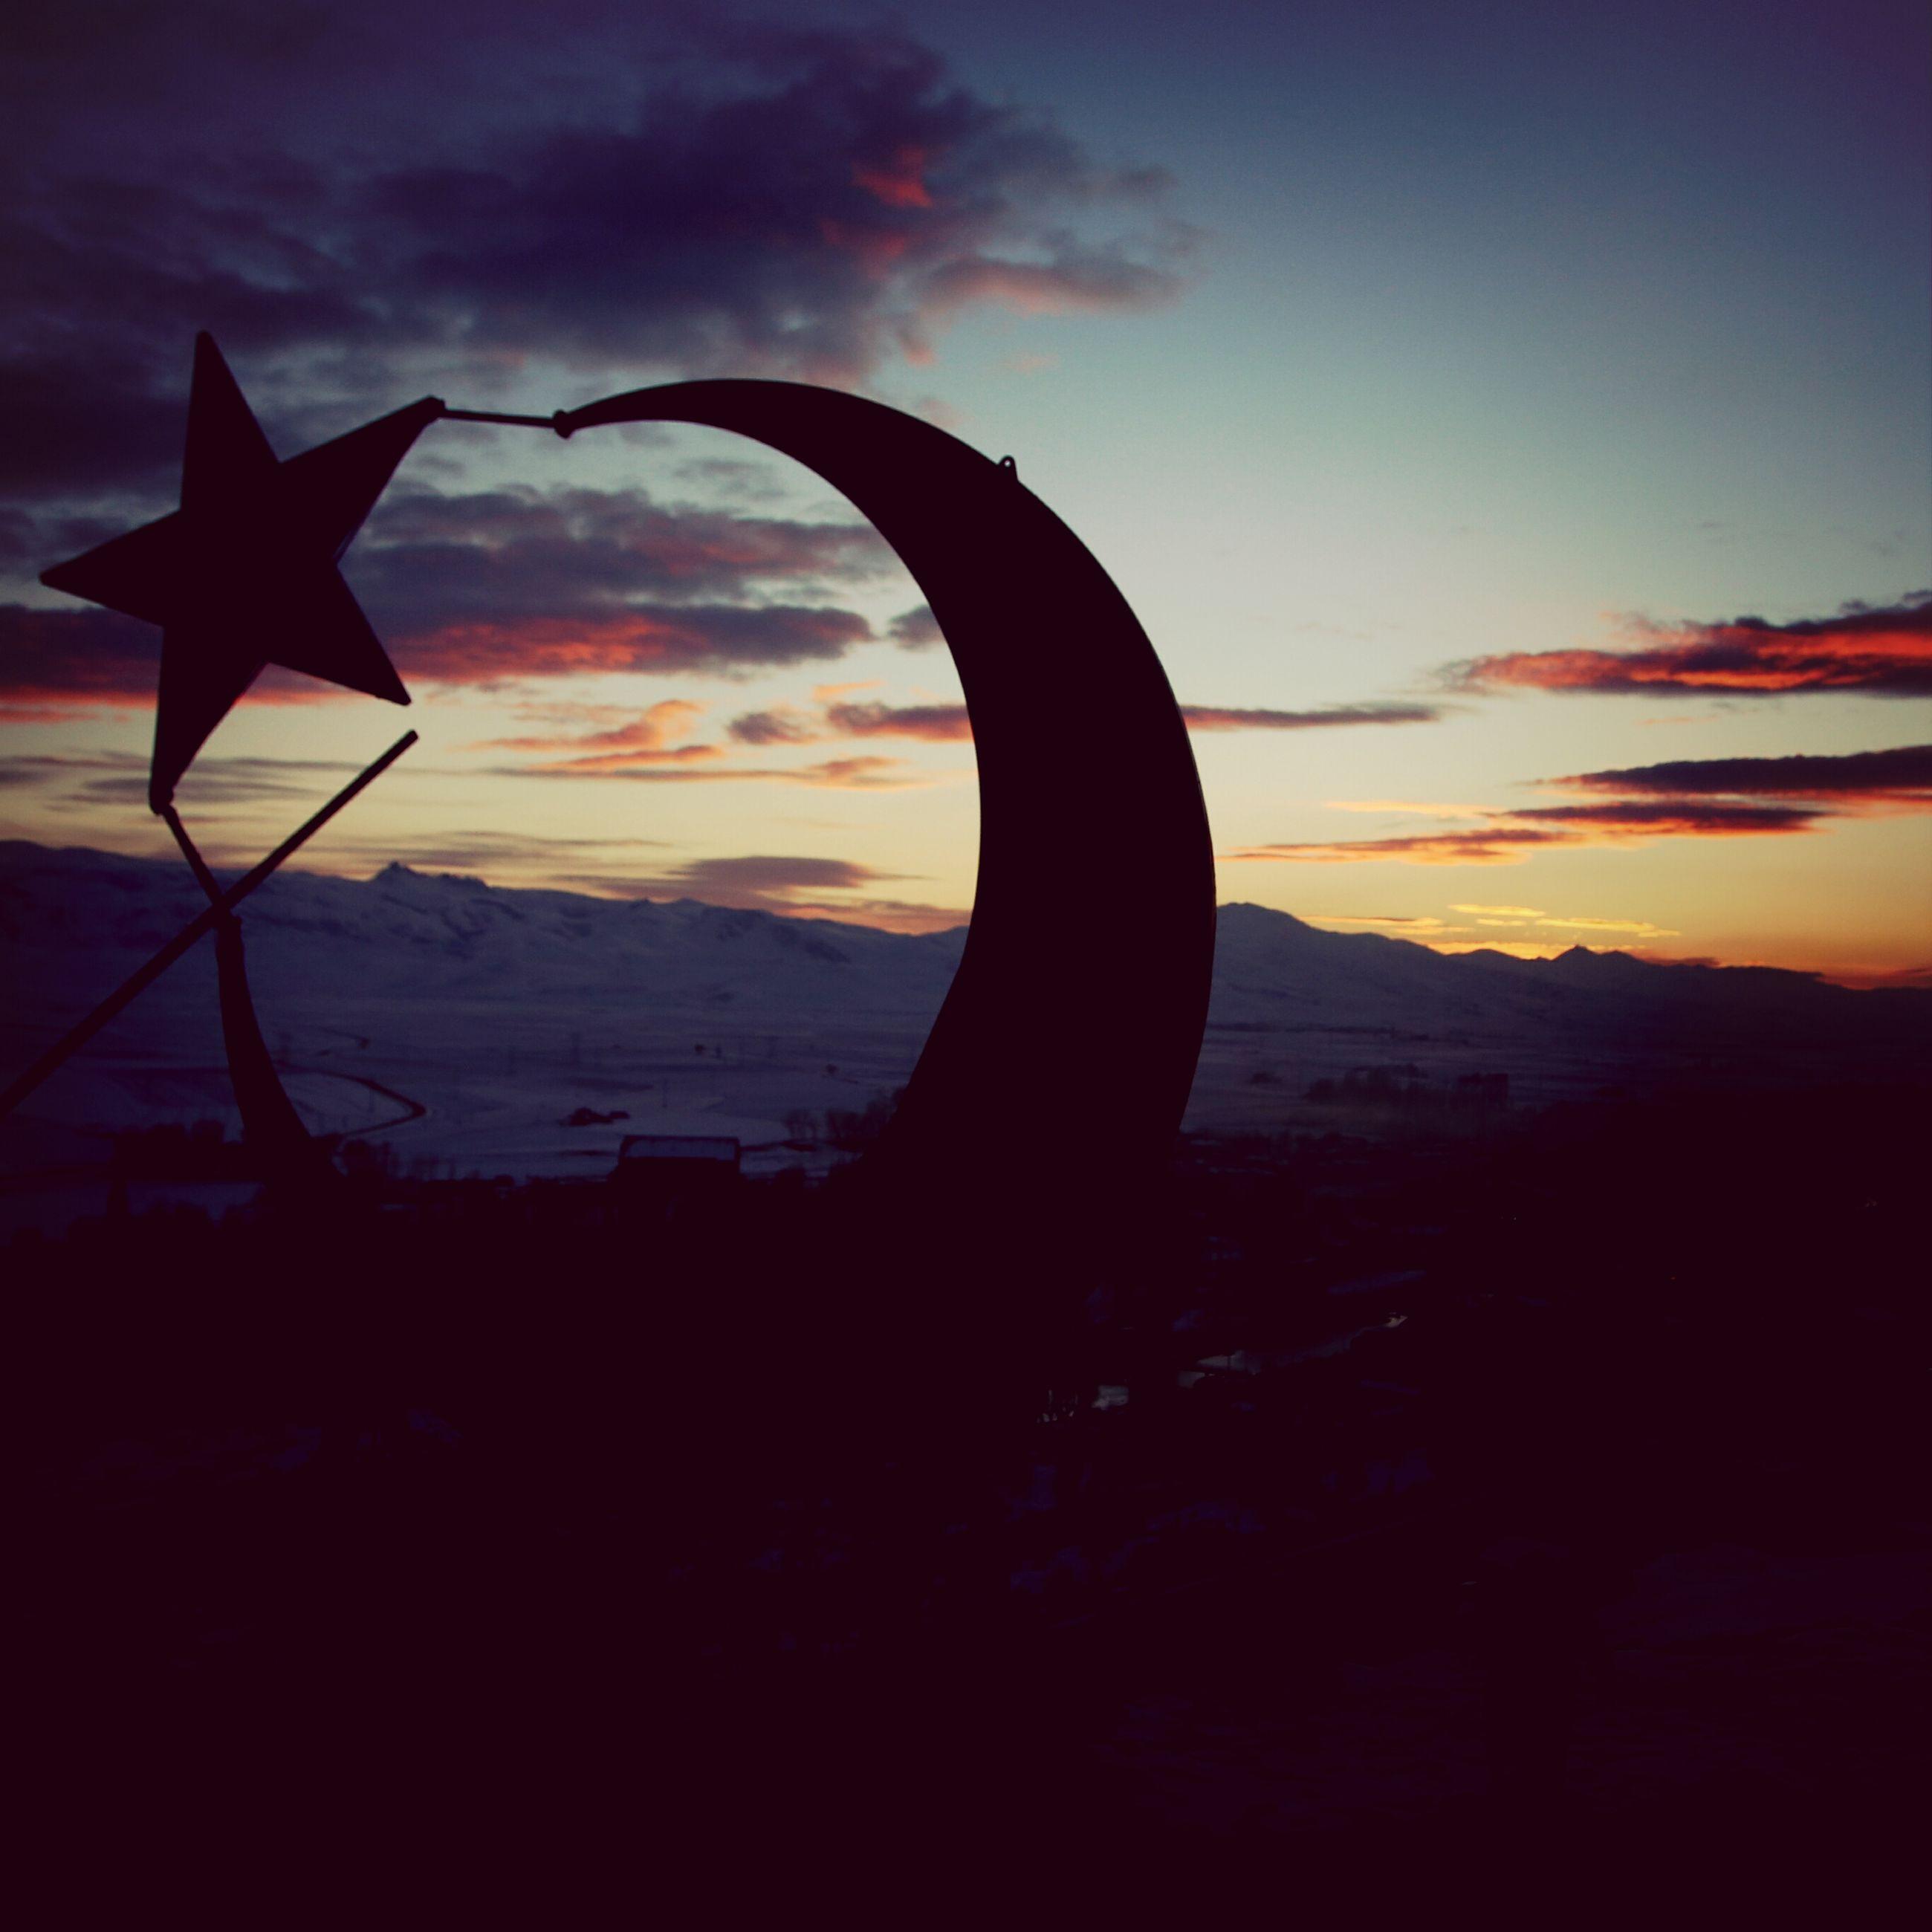 sunset, sky, silhouette, cloud - sky, tranquility, tranquil scene, scenics, cloud, beauty in nature, orange color, beach, nature, landscape, idyllic, dusk, outdoors, sea, cloudy, dramatic sky, shore